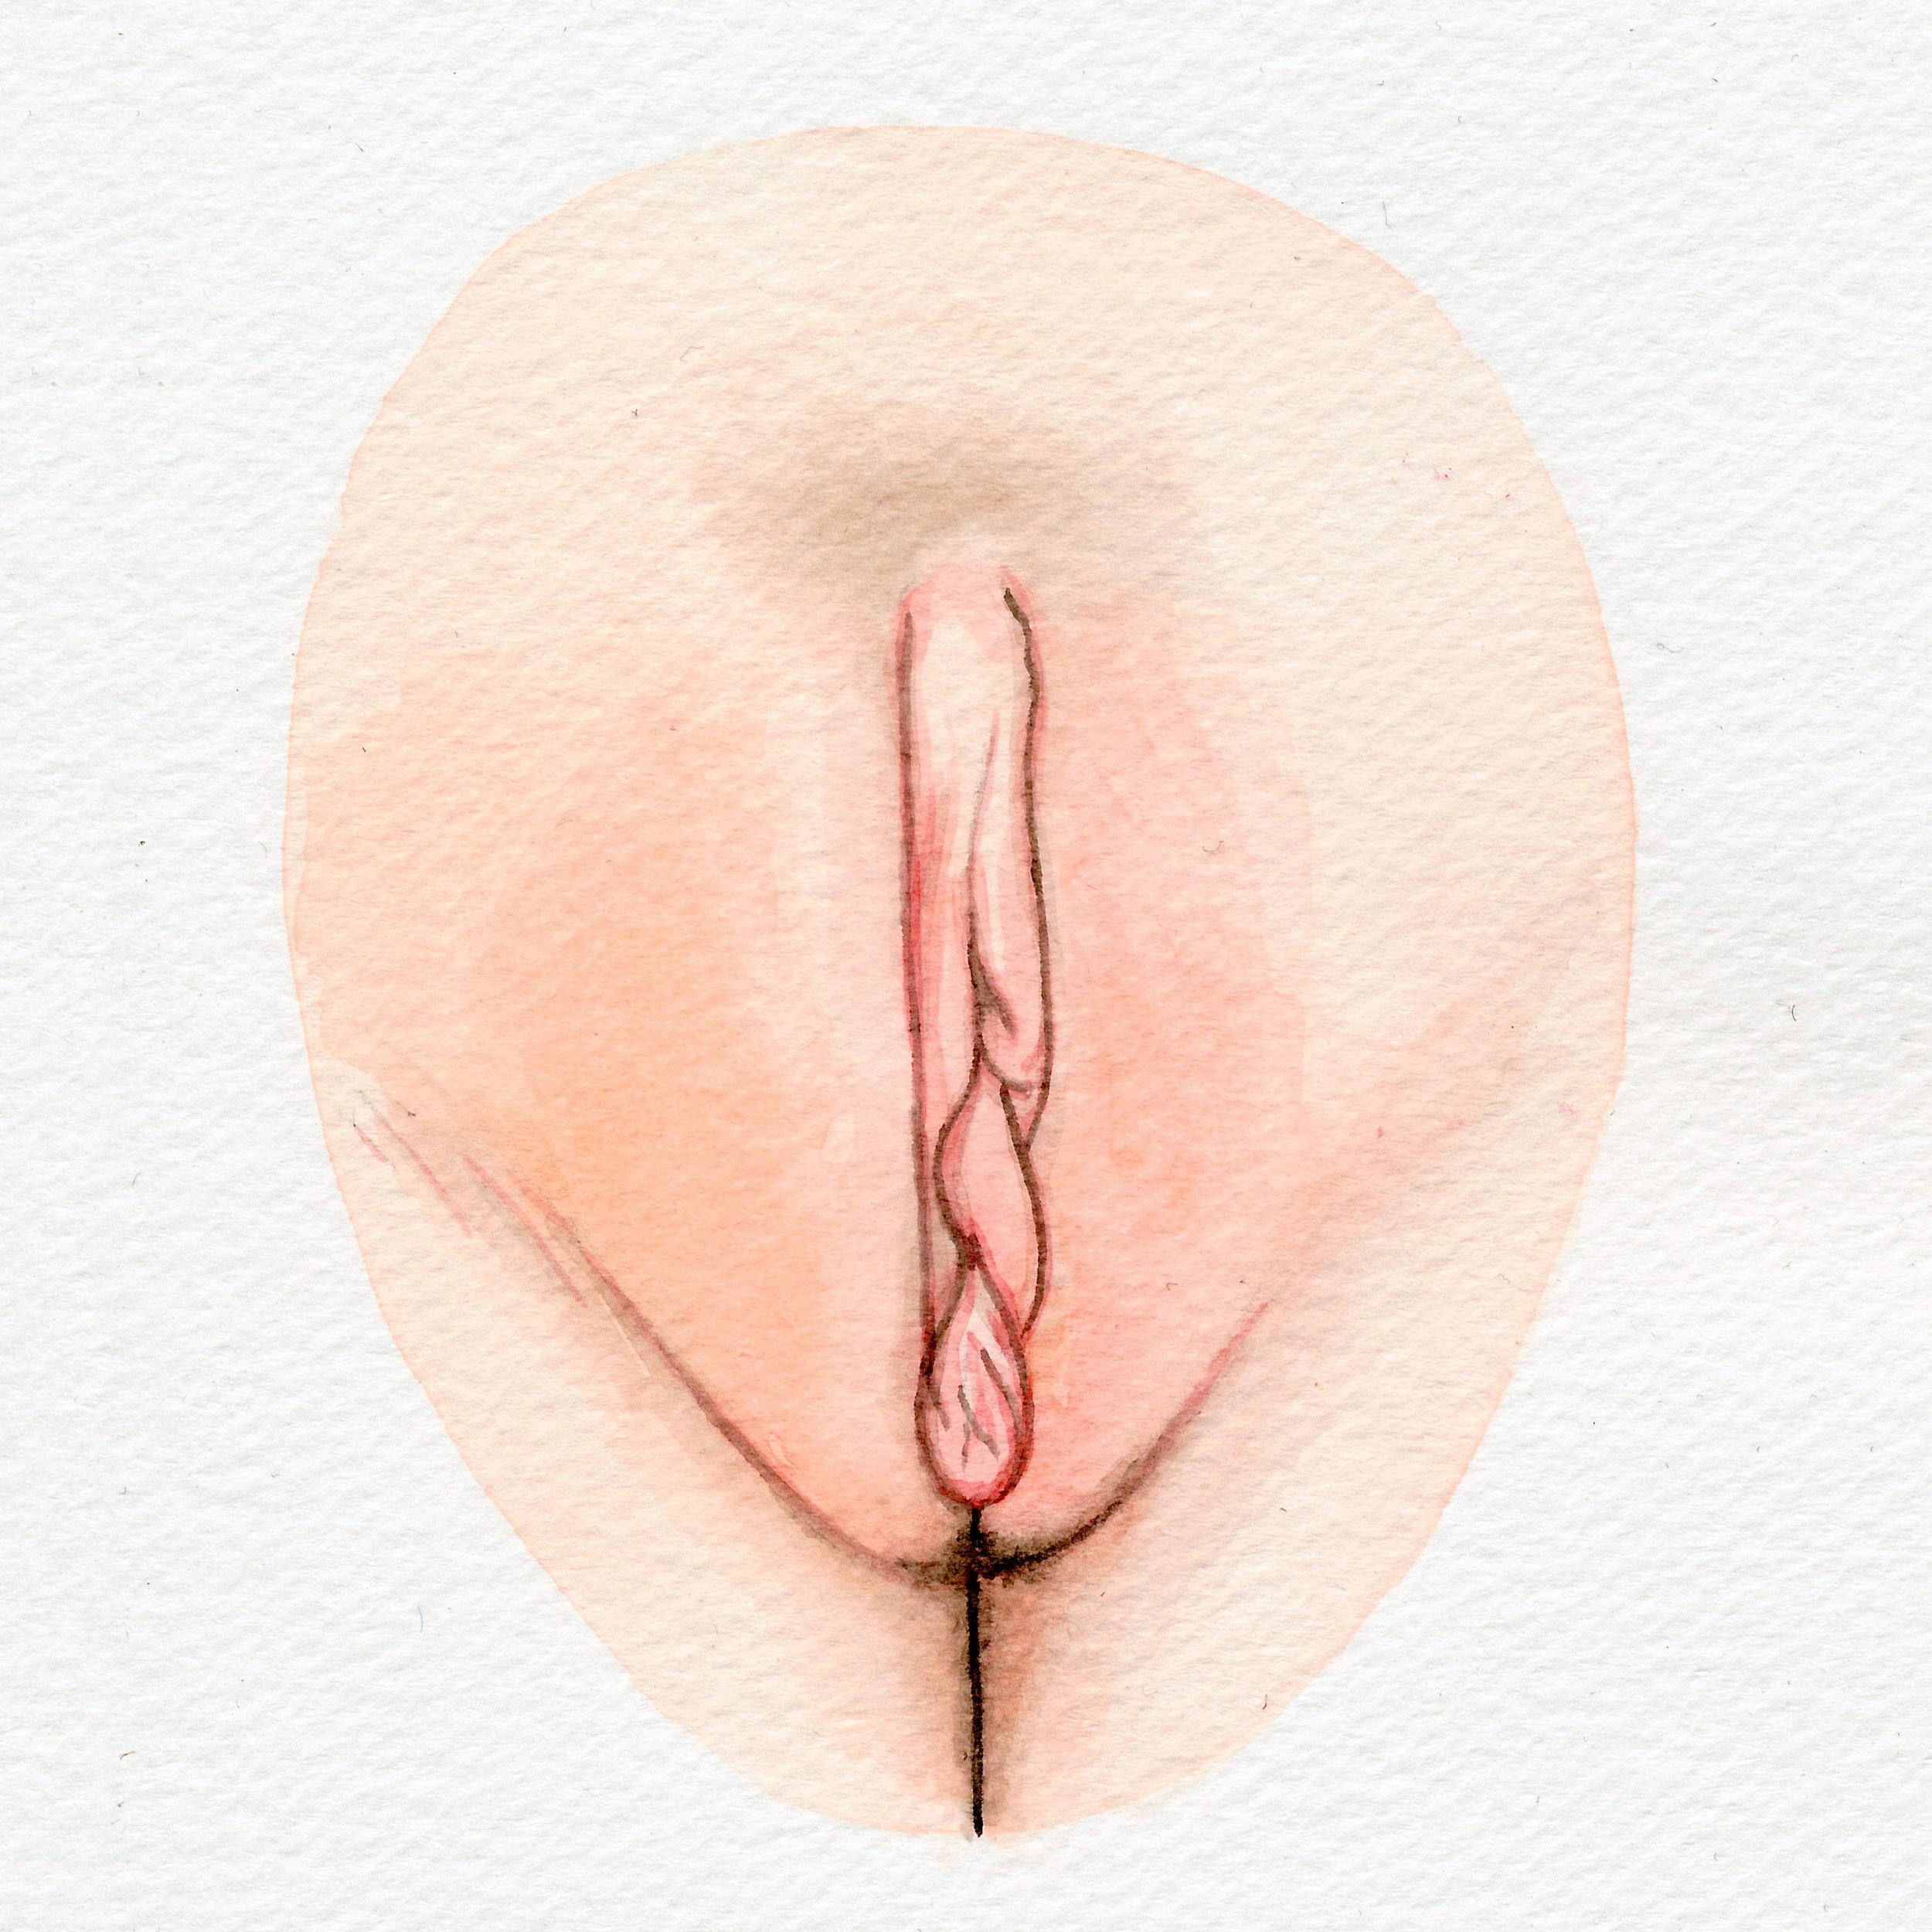 The Vulva Gallery - Vulva Portrait #116 (s).jpg